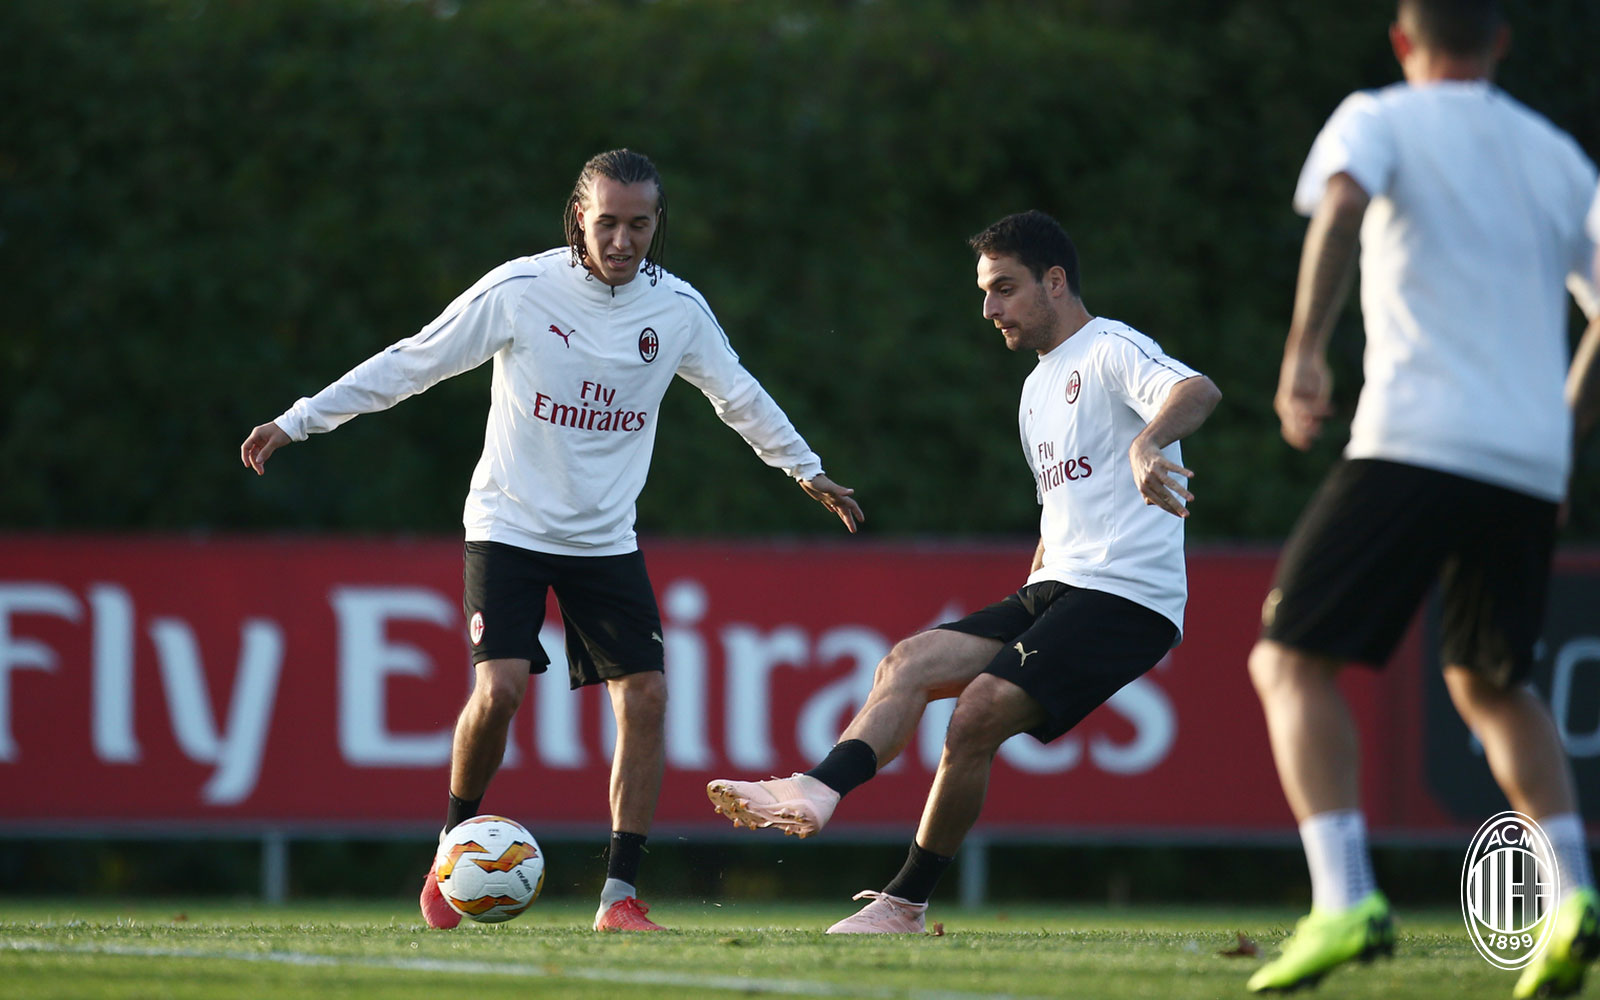 Giacomo Bonaventura and Diego Laxalt during training at Milanello. (@acmilan.com)